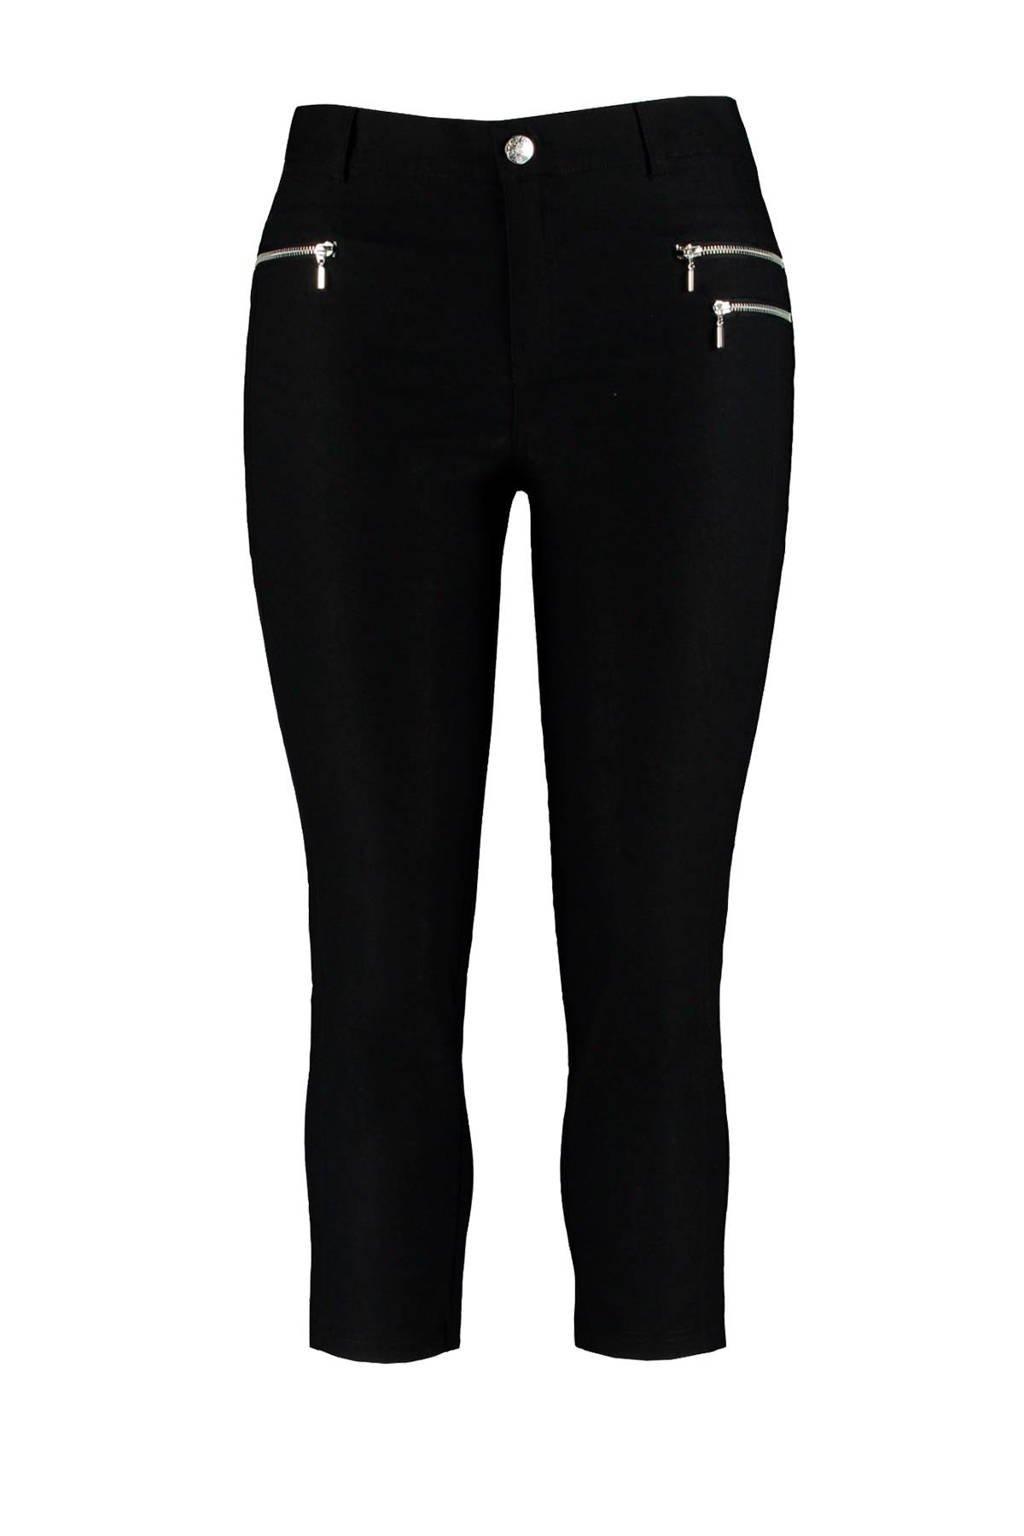 MS Mode slim fit capri met hoge taille zwart, Zwart